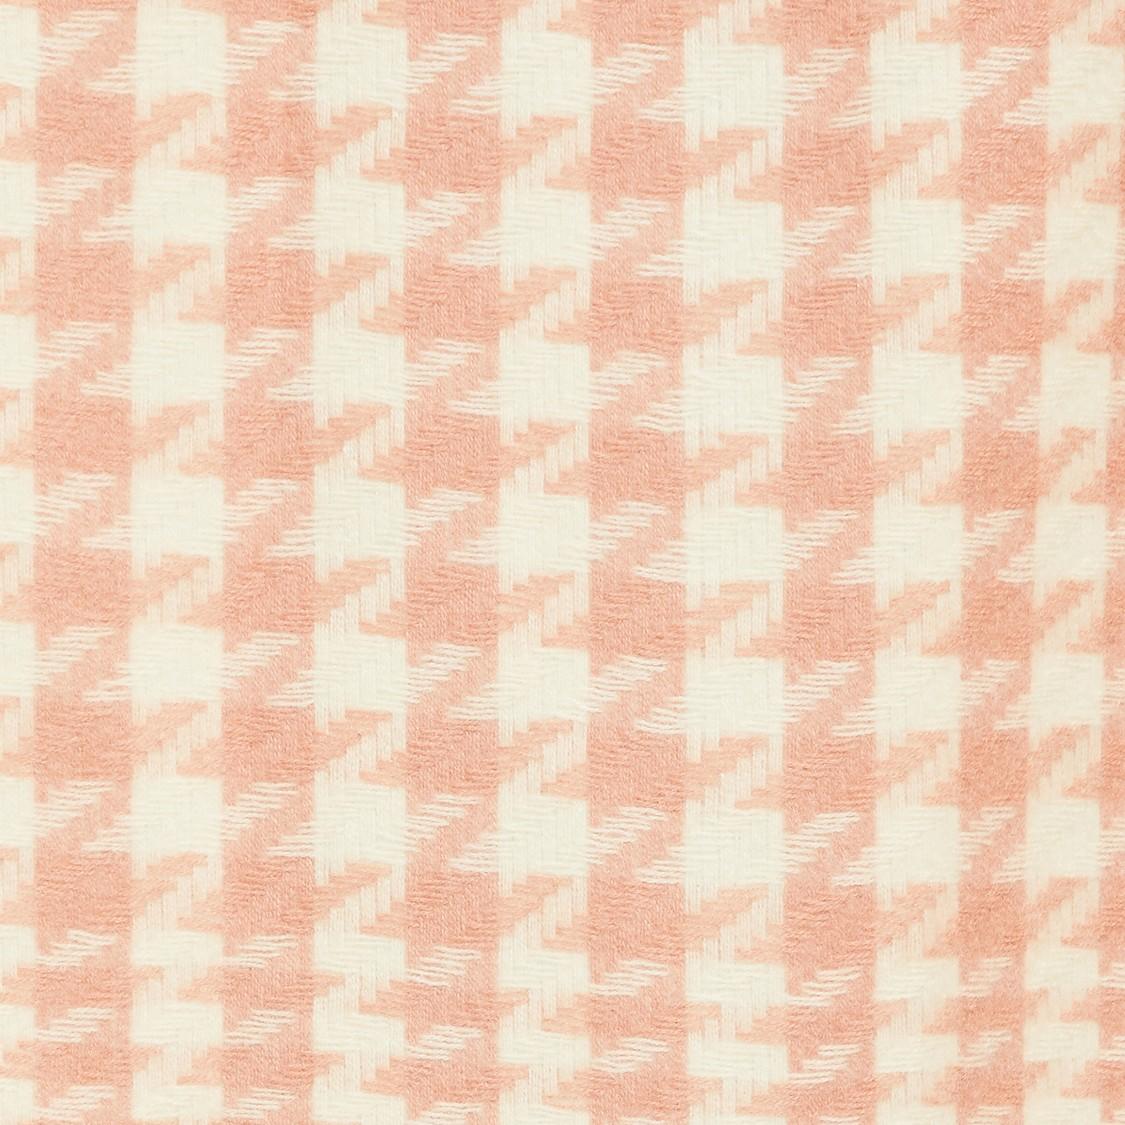 MAX Houndstooth Knit Tassel Detailed Muffler